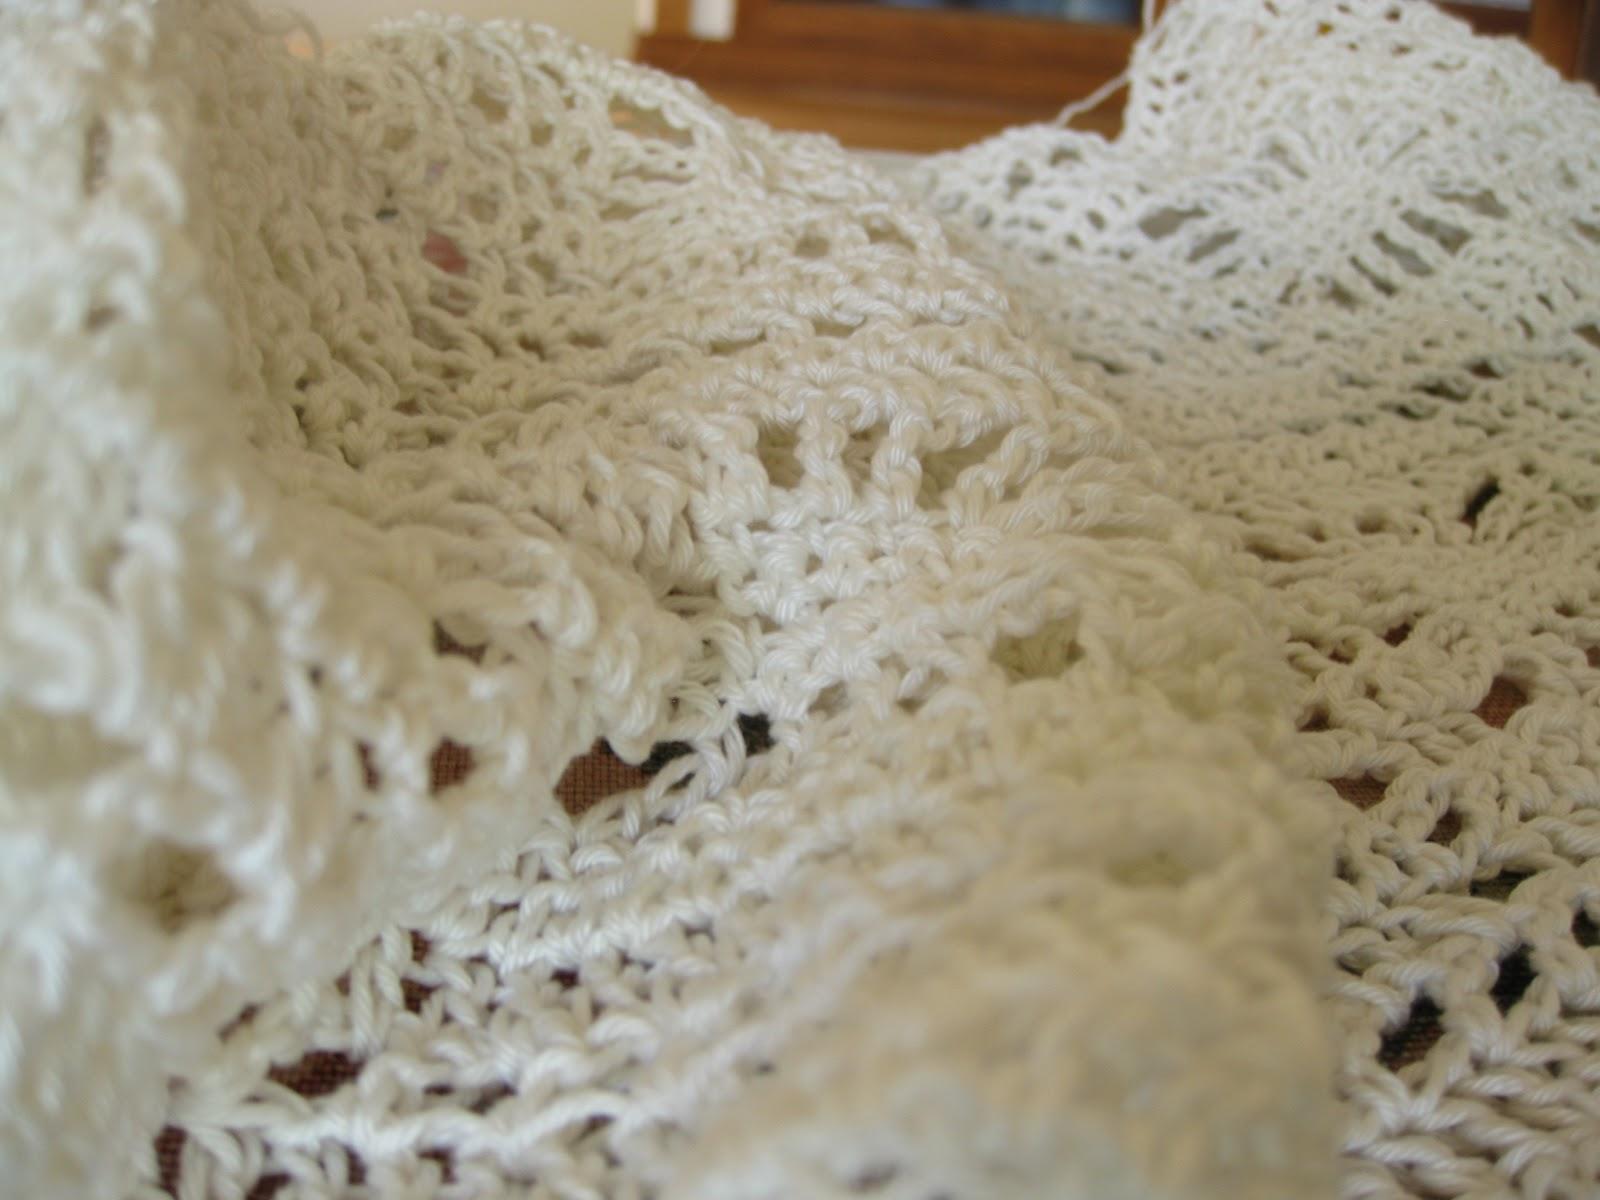 Crochet Heirloom Stitches : Crochet Heirloom Baby Blanket